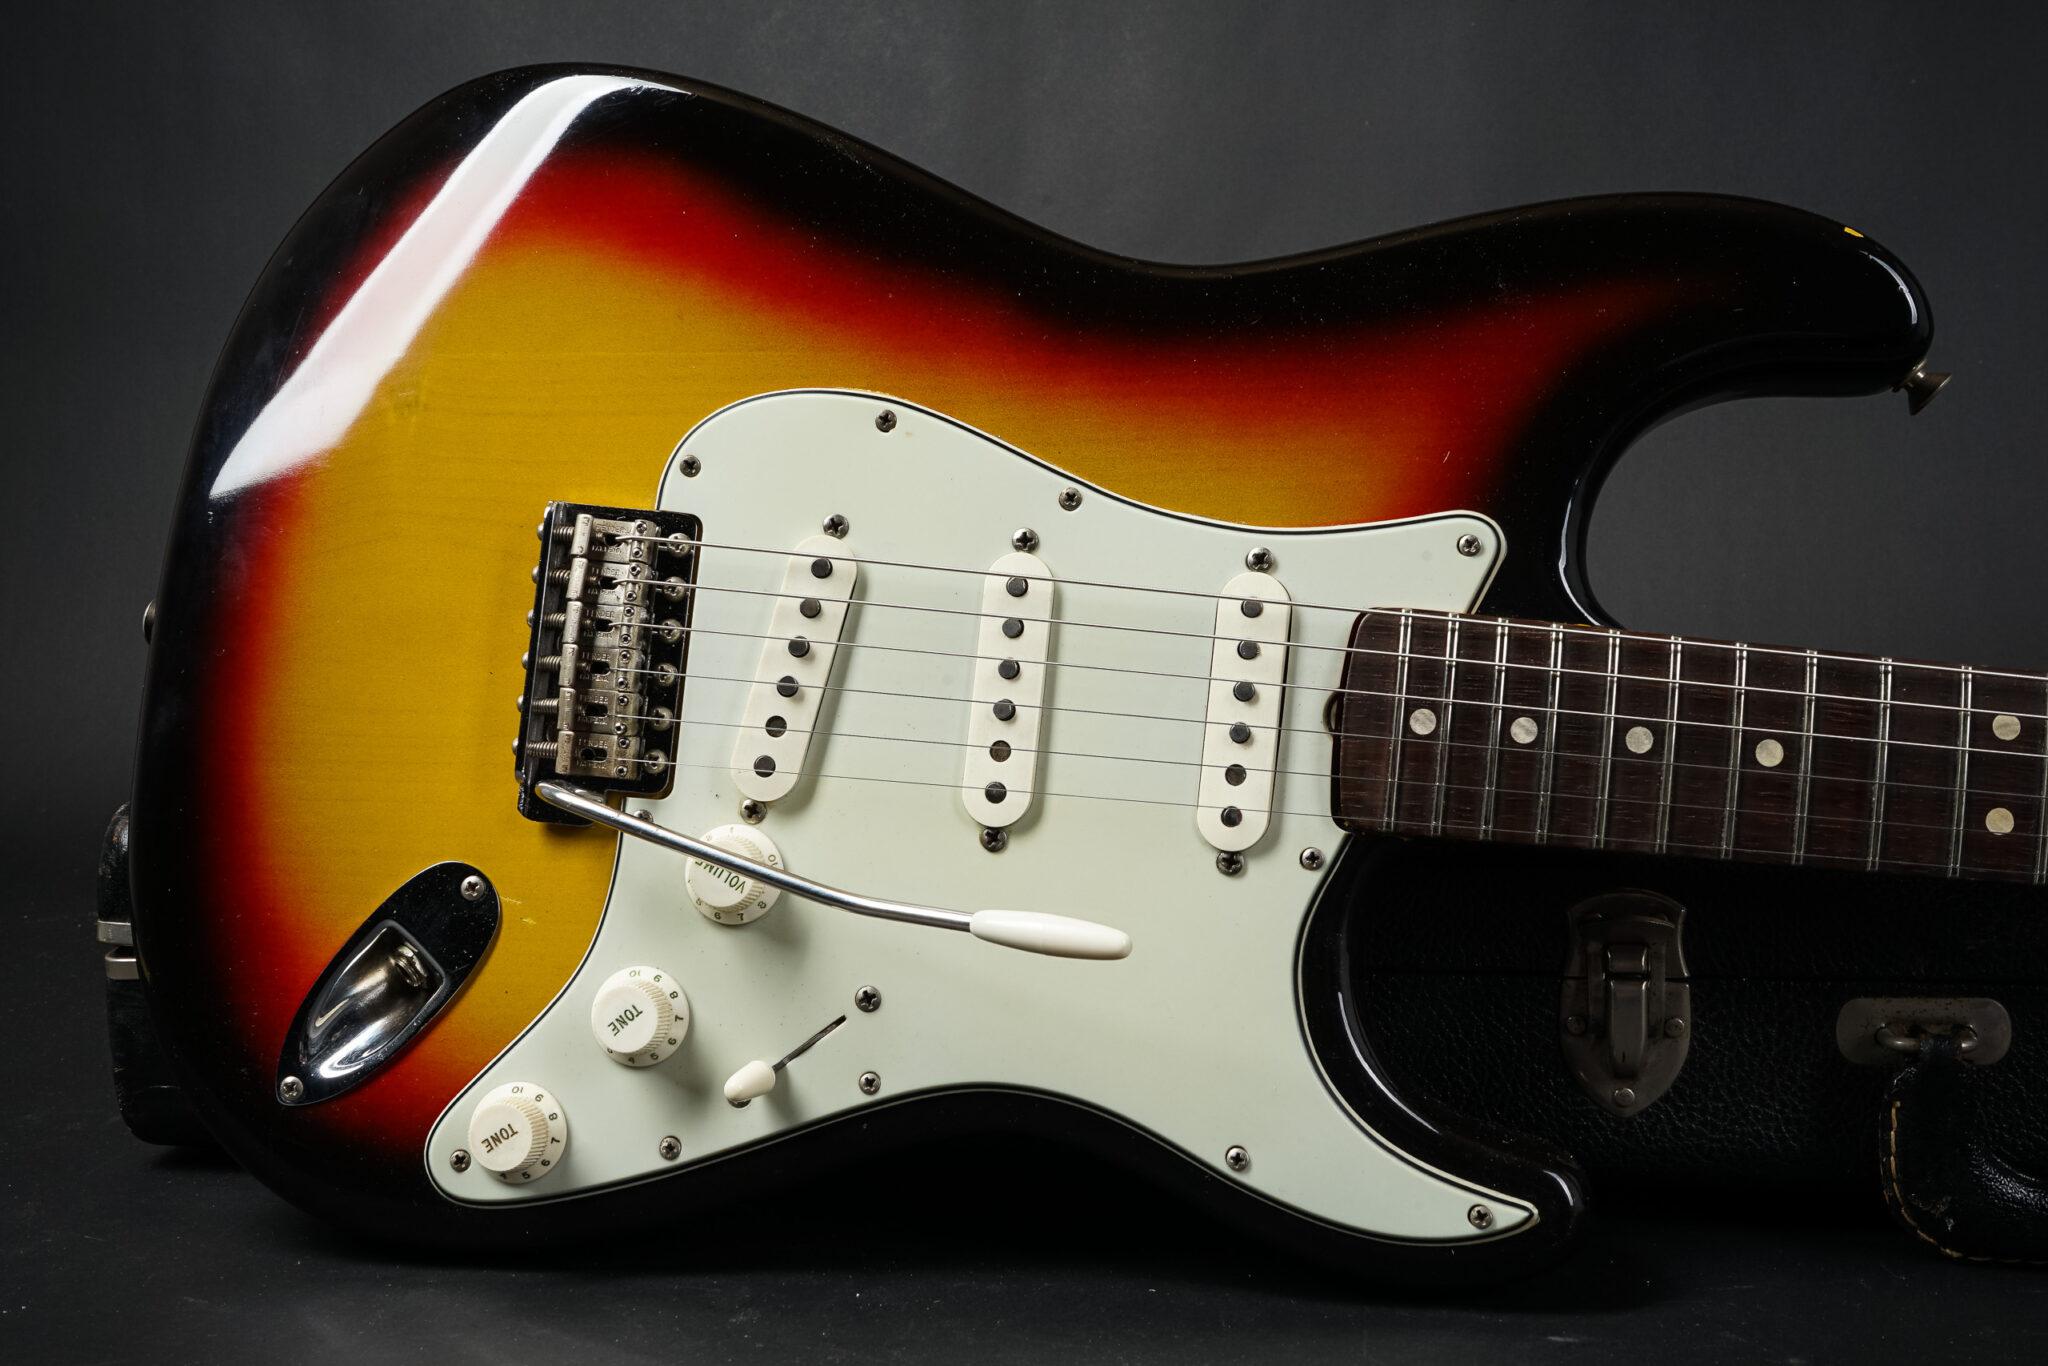 https://guitarpoint.de/app/uploads/products/1964-fender-stratocaster-sunburst-clean/1964-Fender-Stratocaster-Sunburst-L48763-9-2048x1366.jpg